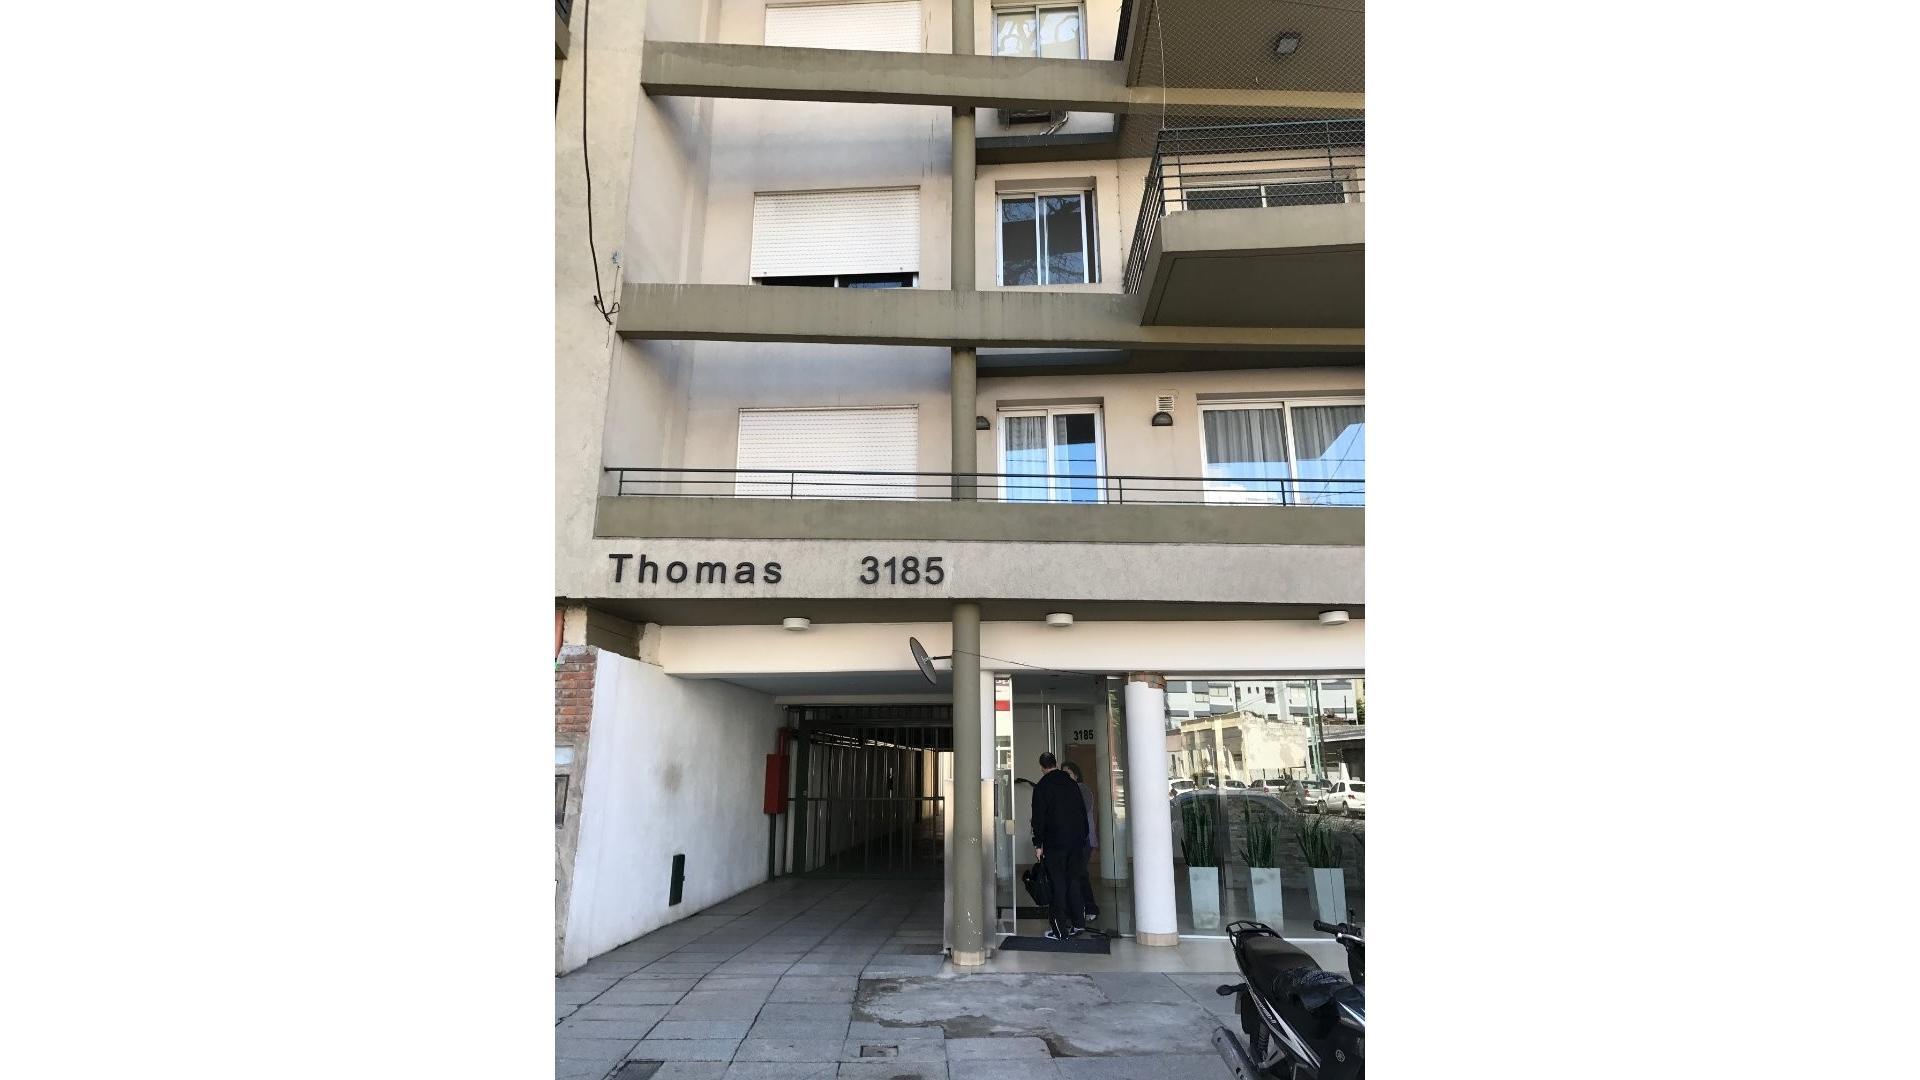 2 amb. frte. balcón M/lumin edif nuevo 4 años, pintado impecable, SUM. solar landry